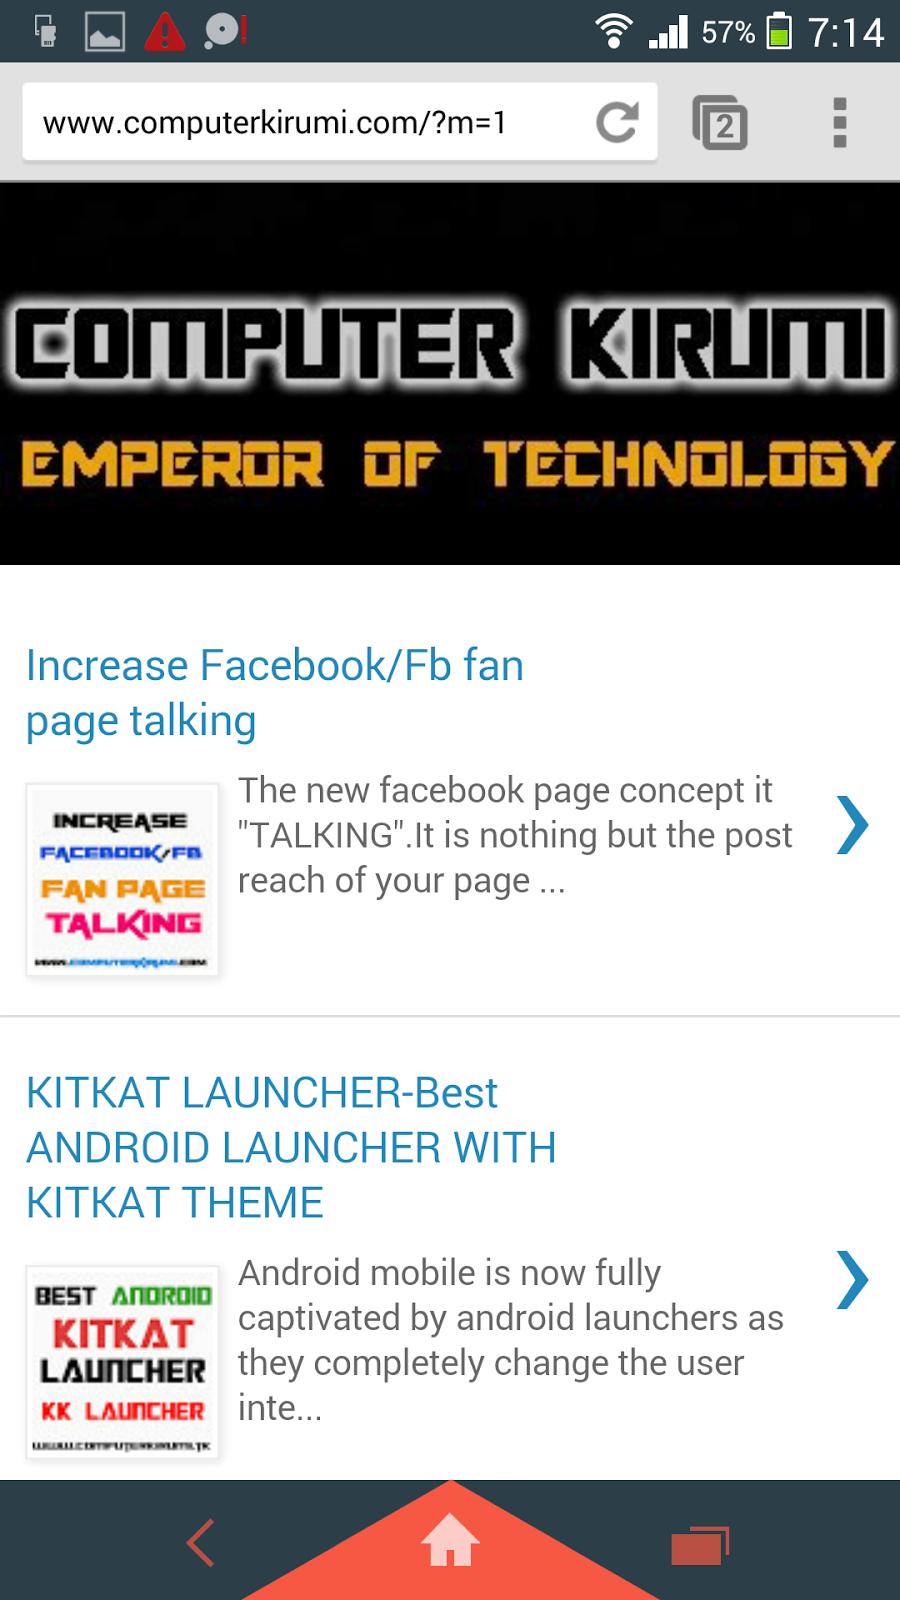 chrome computer kirumi home page